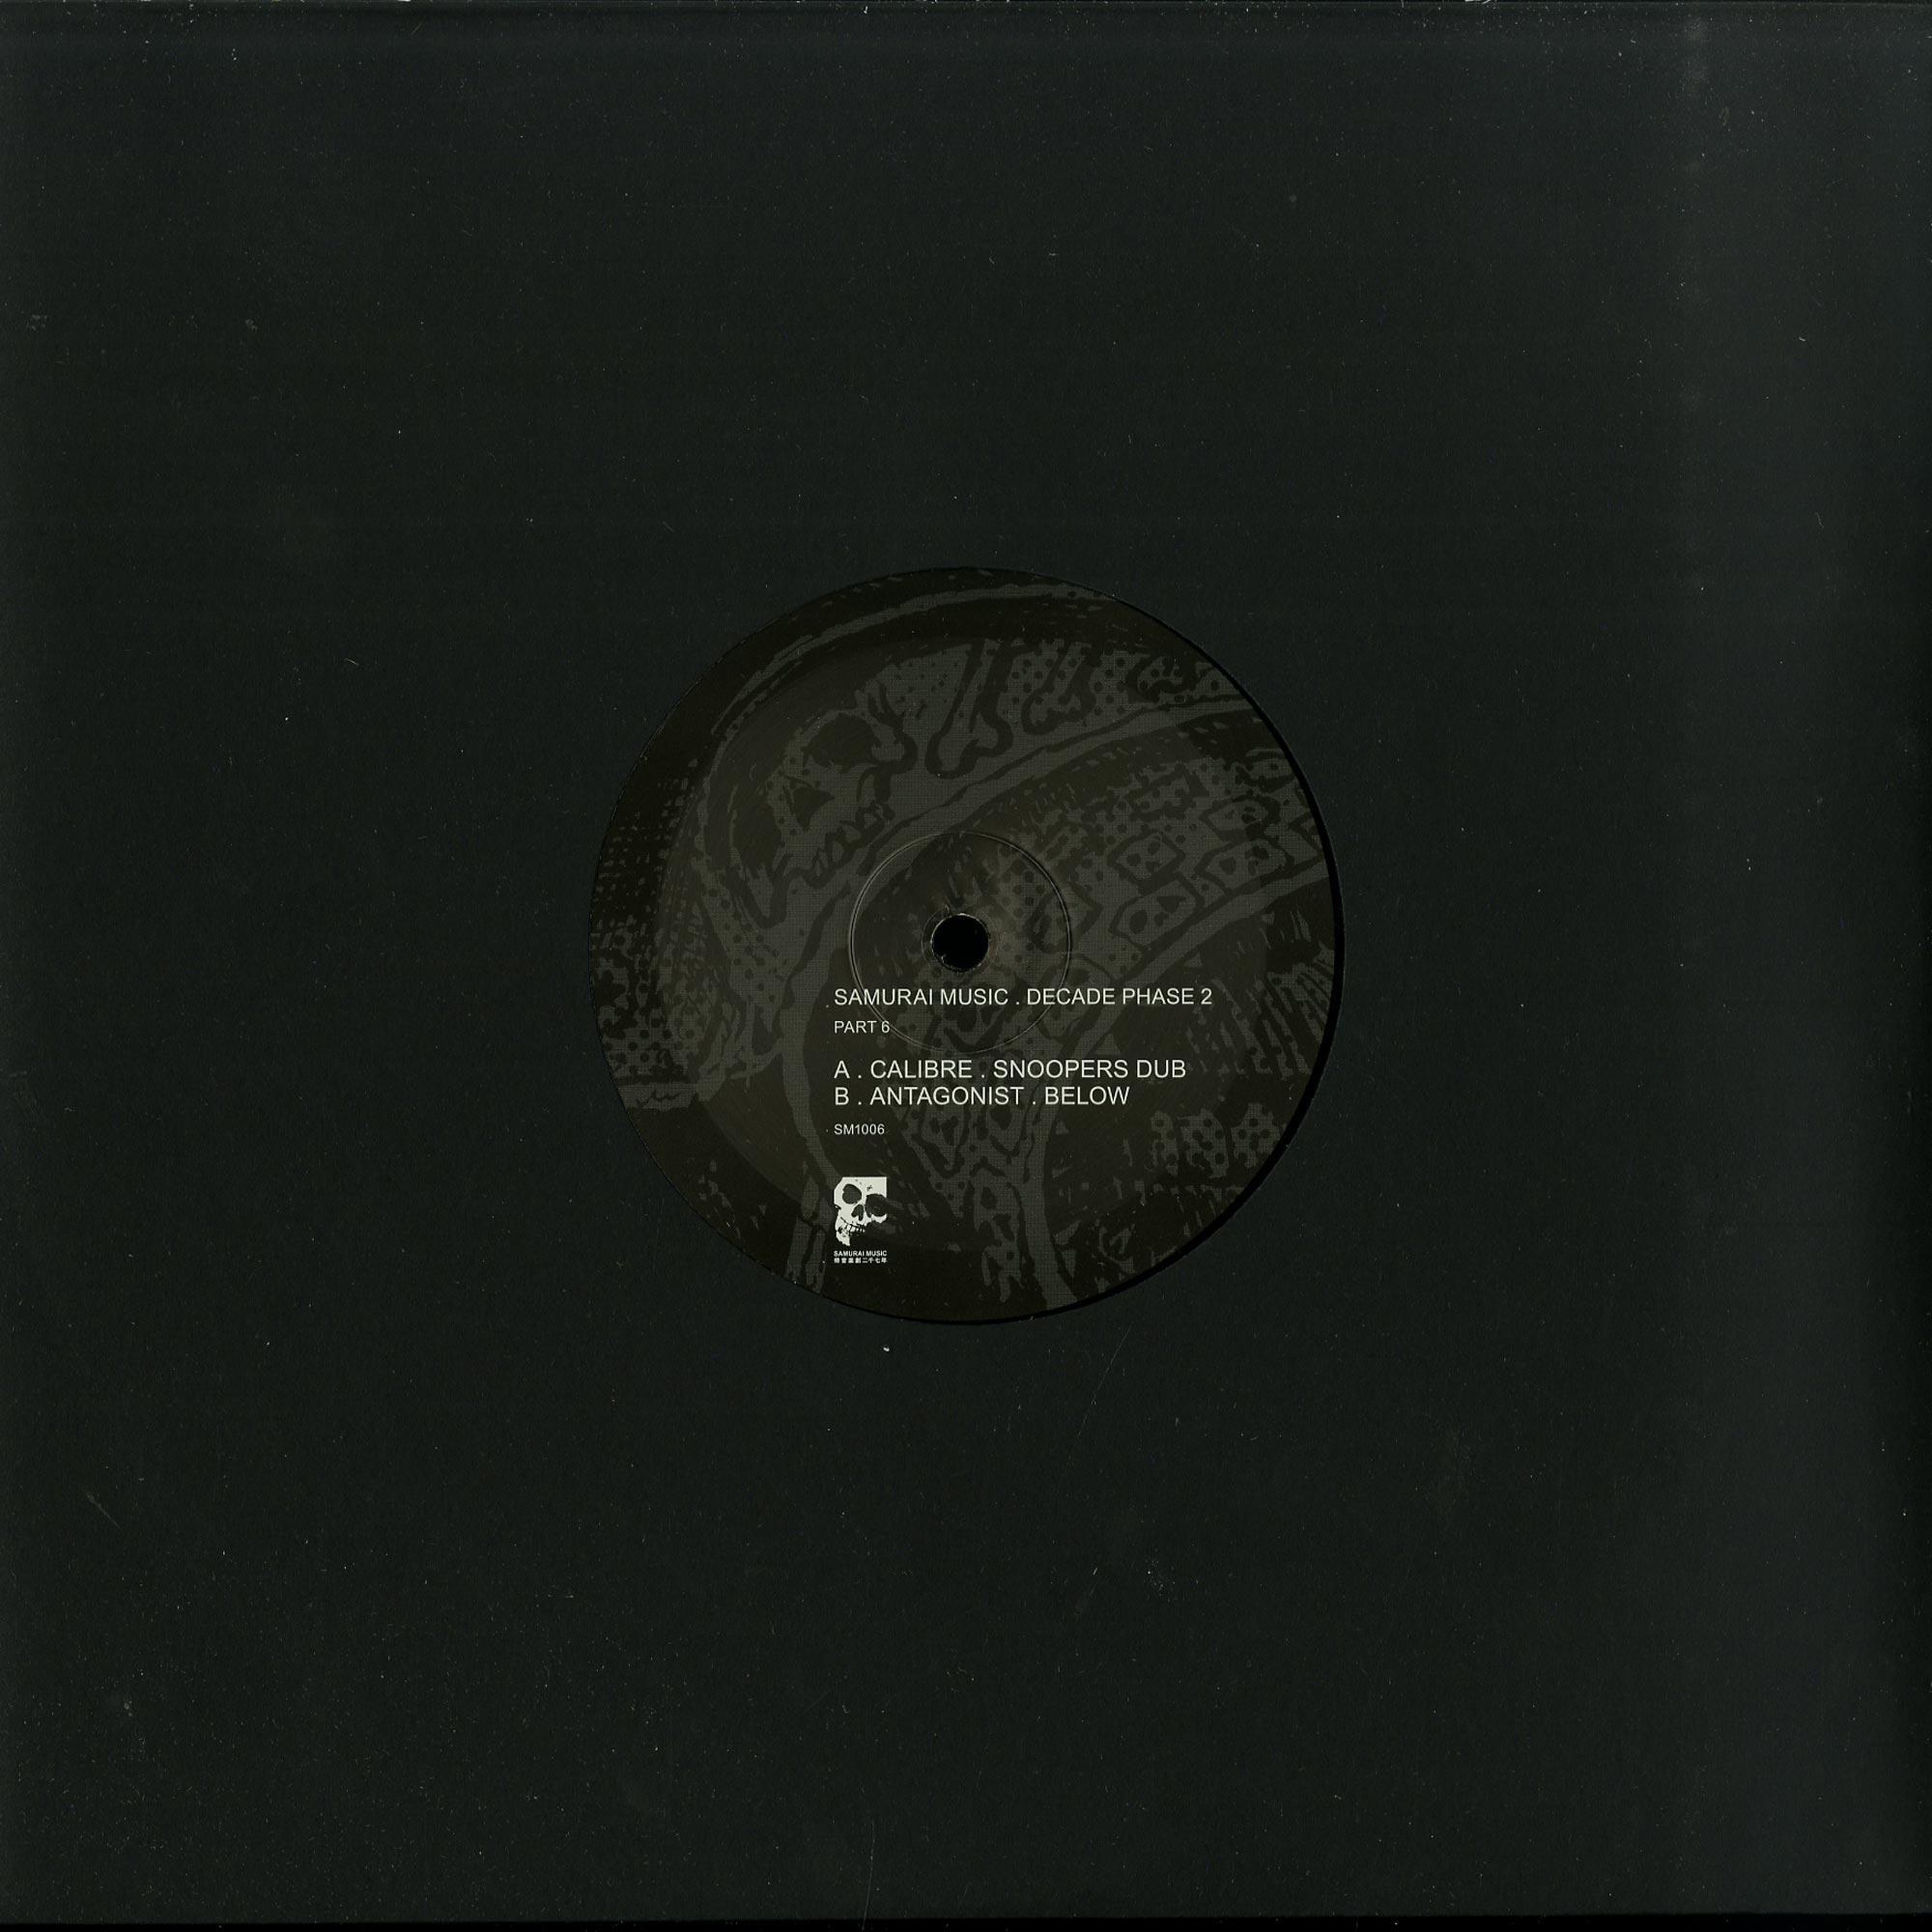 Various Artists - SAMURAI MUSIC DECADE PART 6